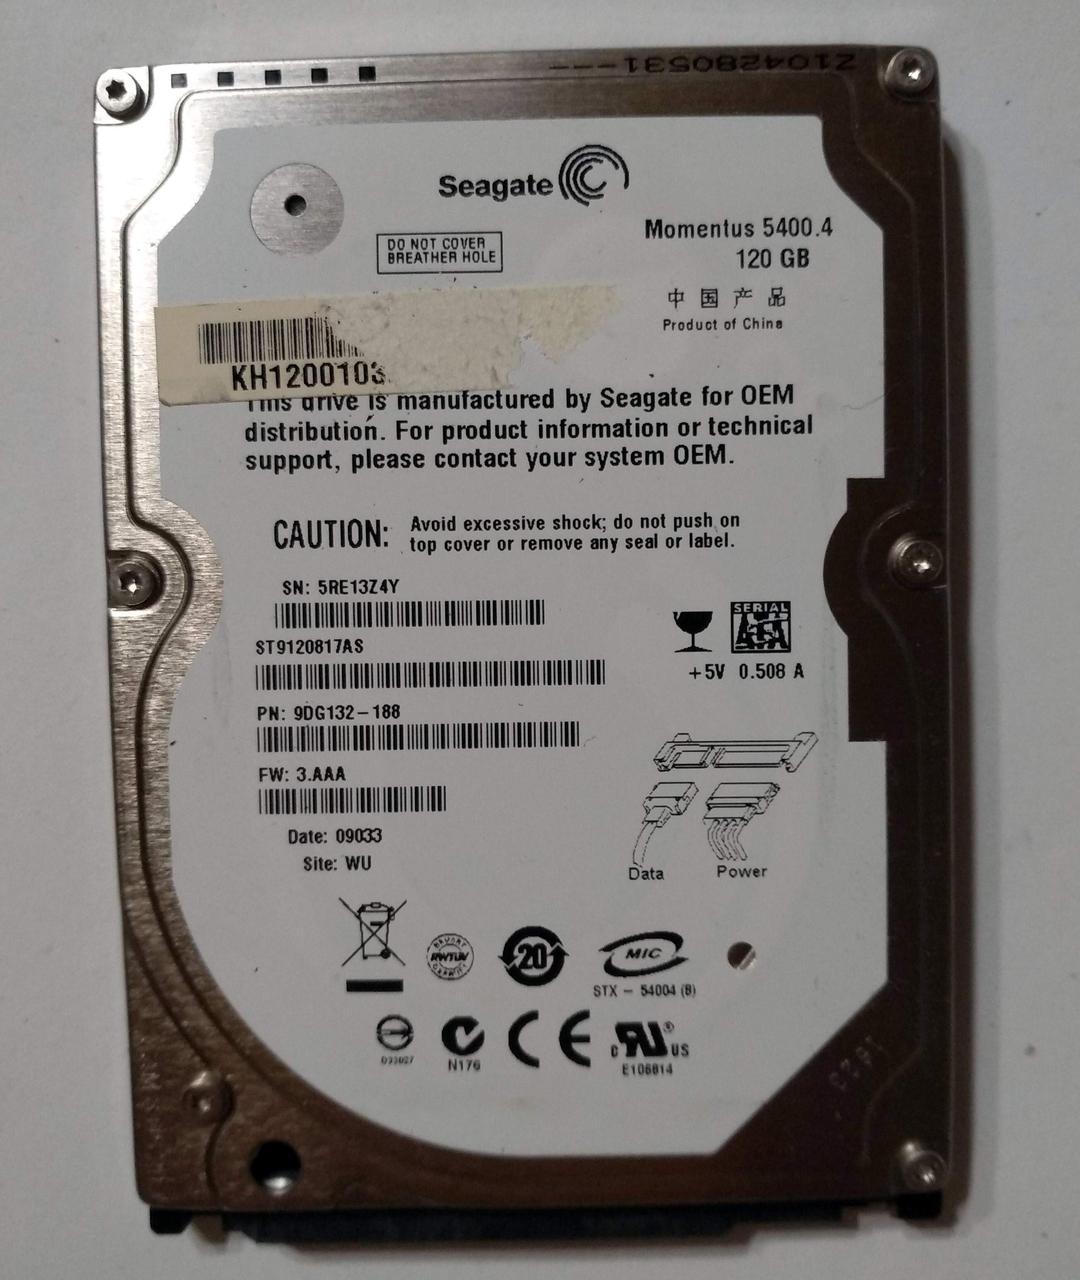 475 HDD Seagate 120 GB SATA2 2.5'' 5400 8MB - ST9120817AS - хорошее состояние